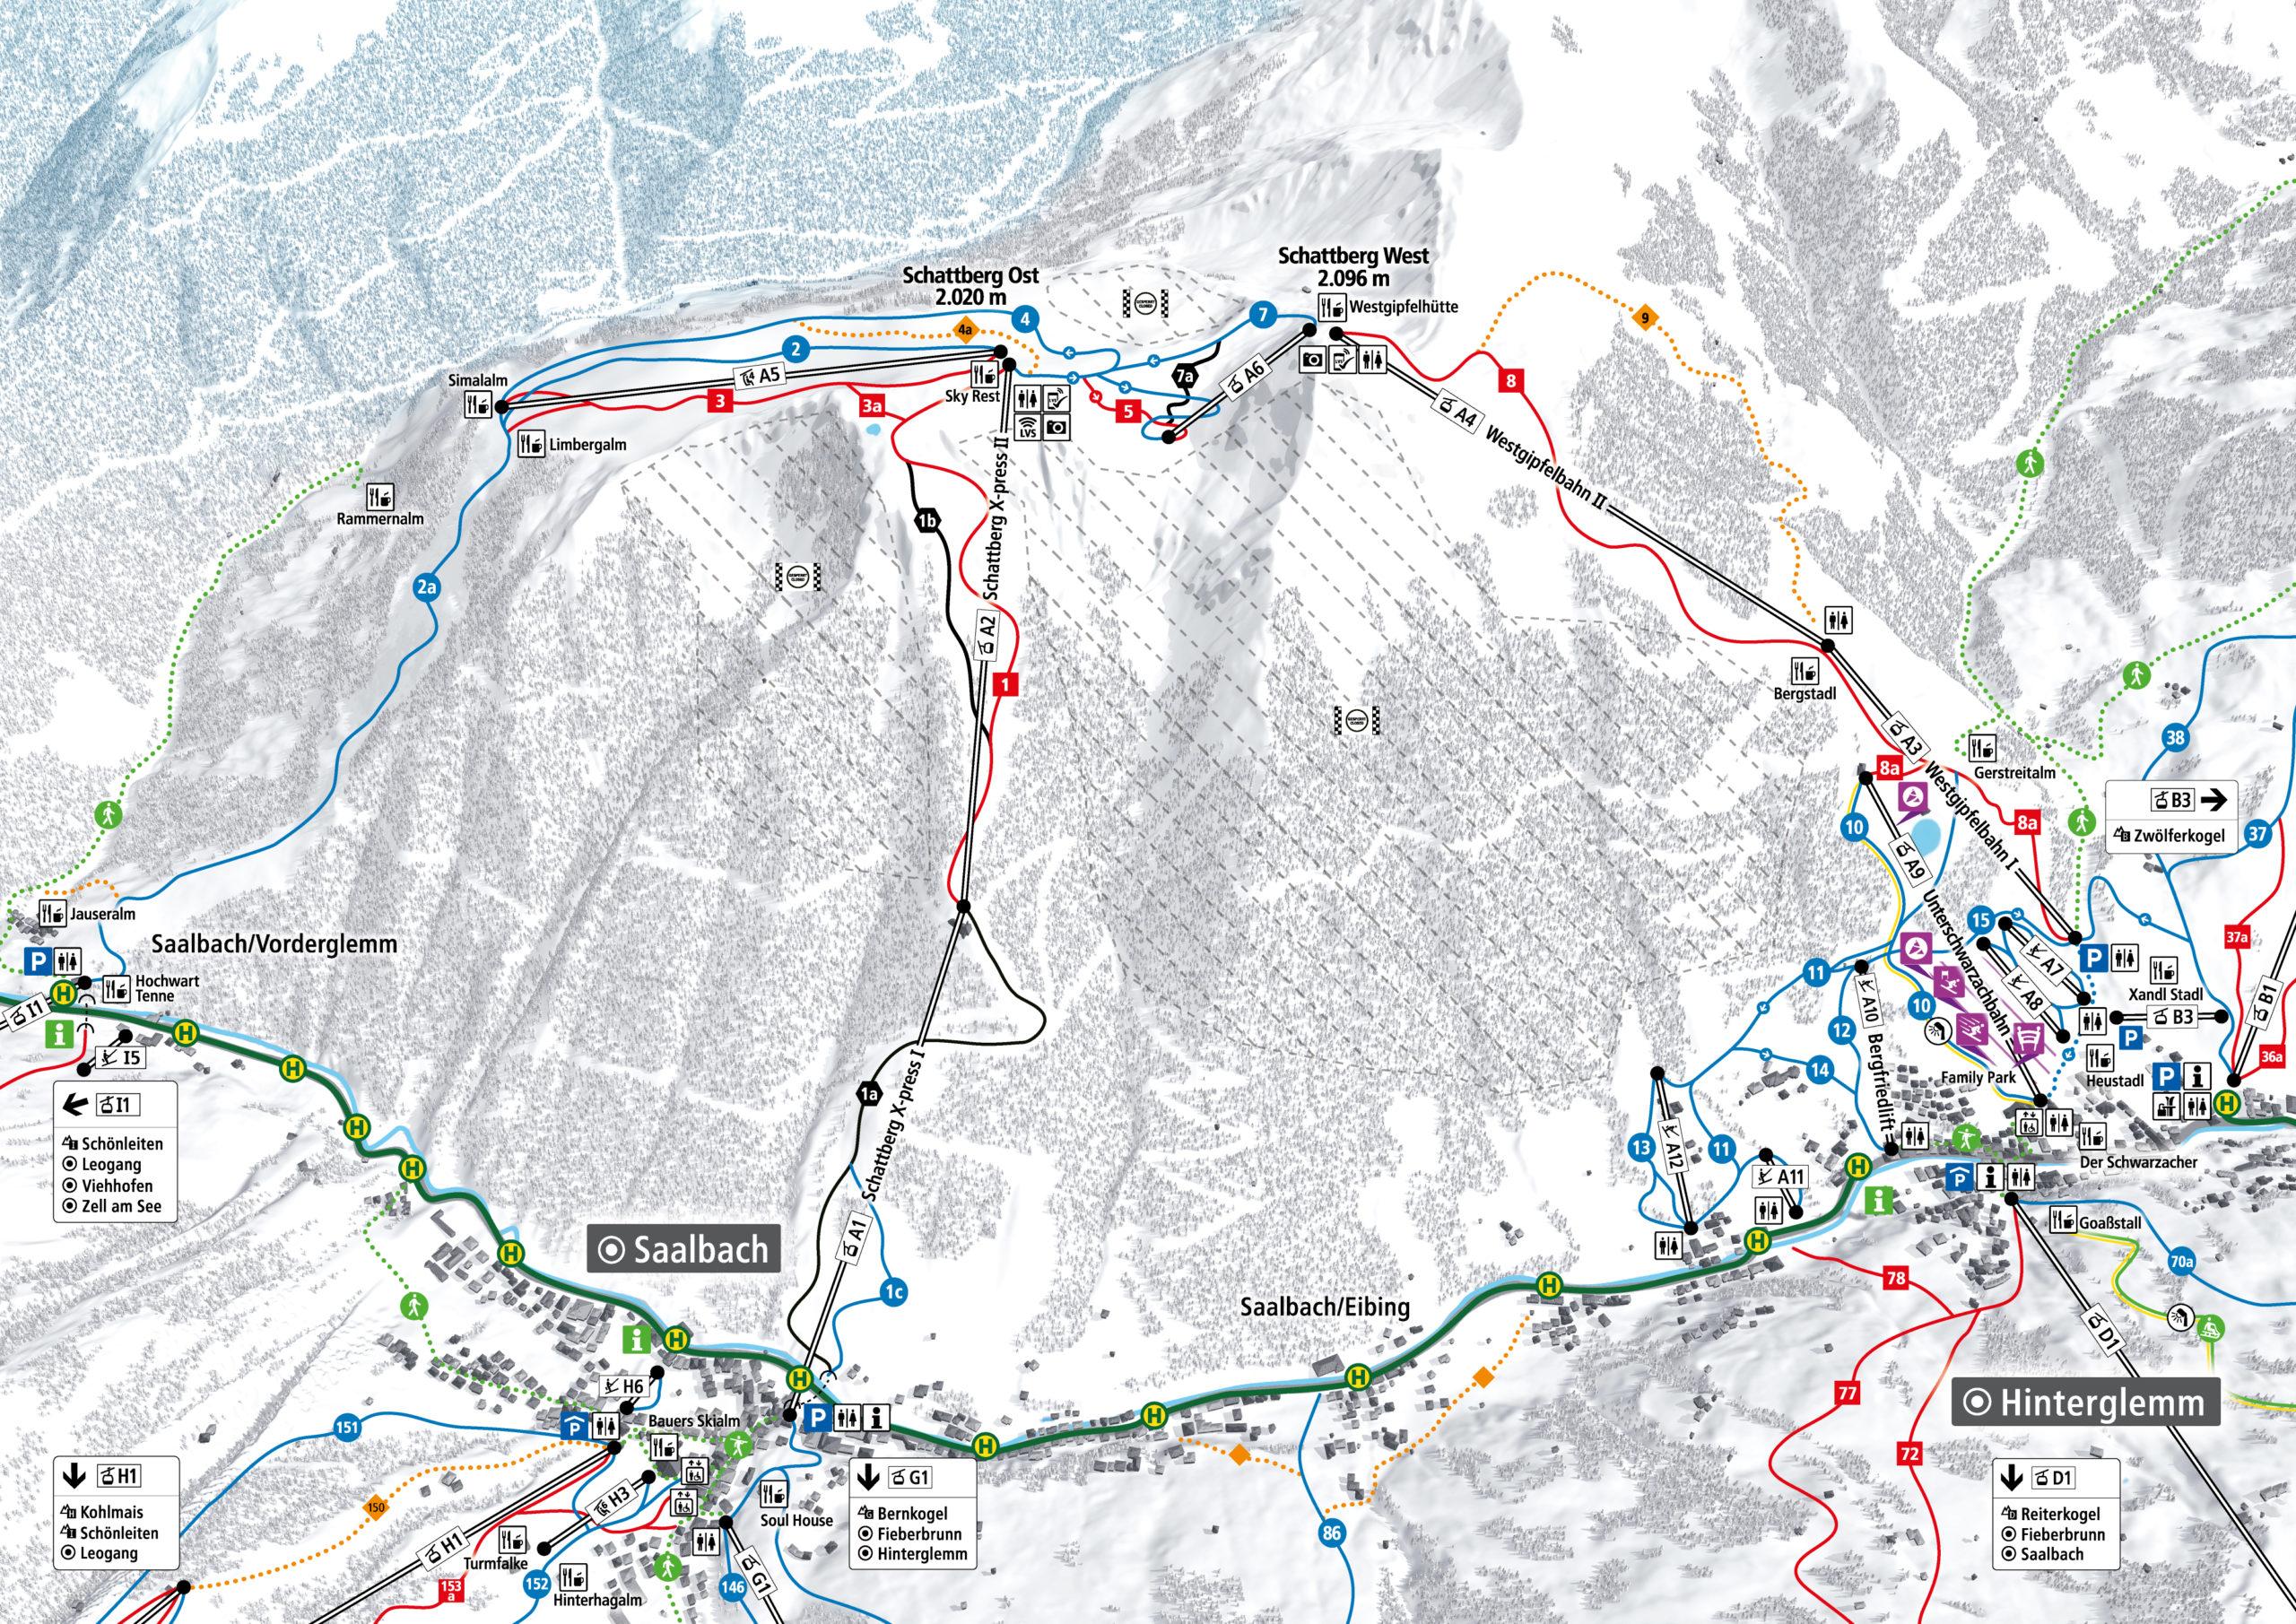 3D Pistenplan und Panoramakarte Skicircus Saalbach Hinterglemm Leogang Fieberbrunn Zone A Schattberg